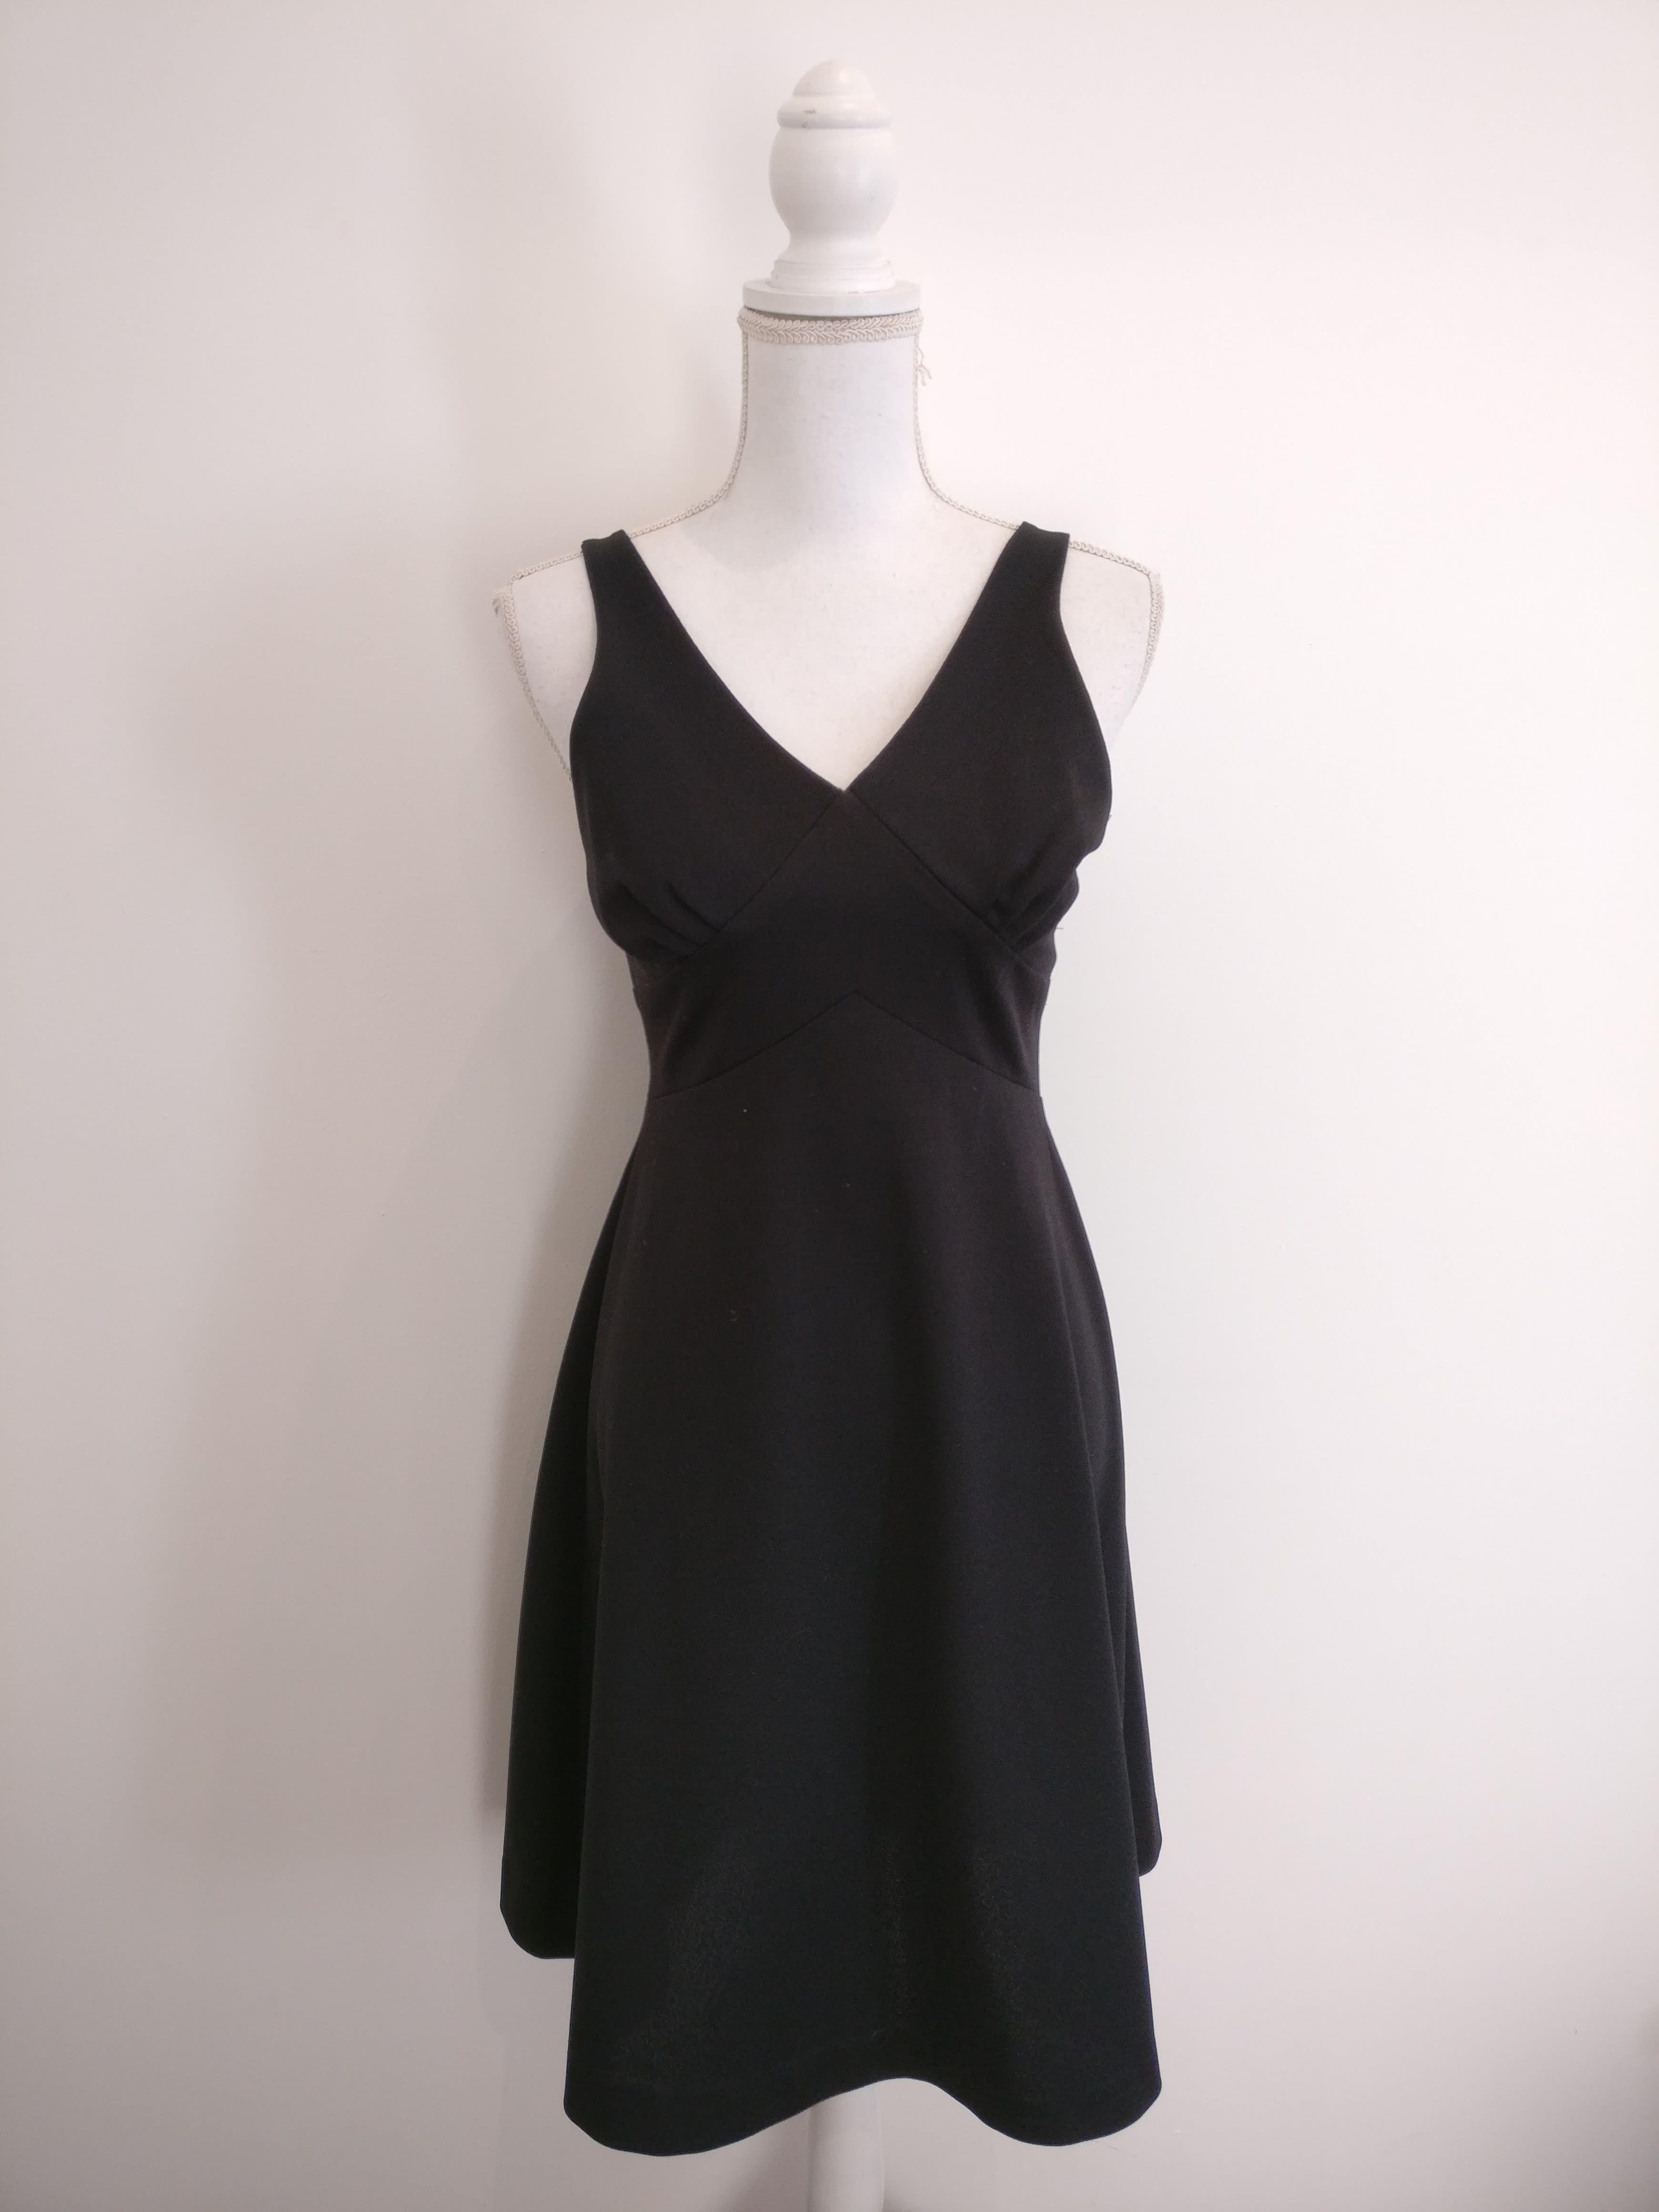 Robes - Robe noire